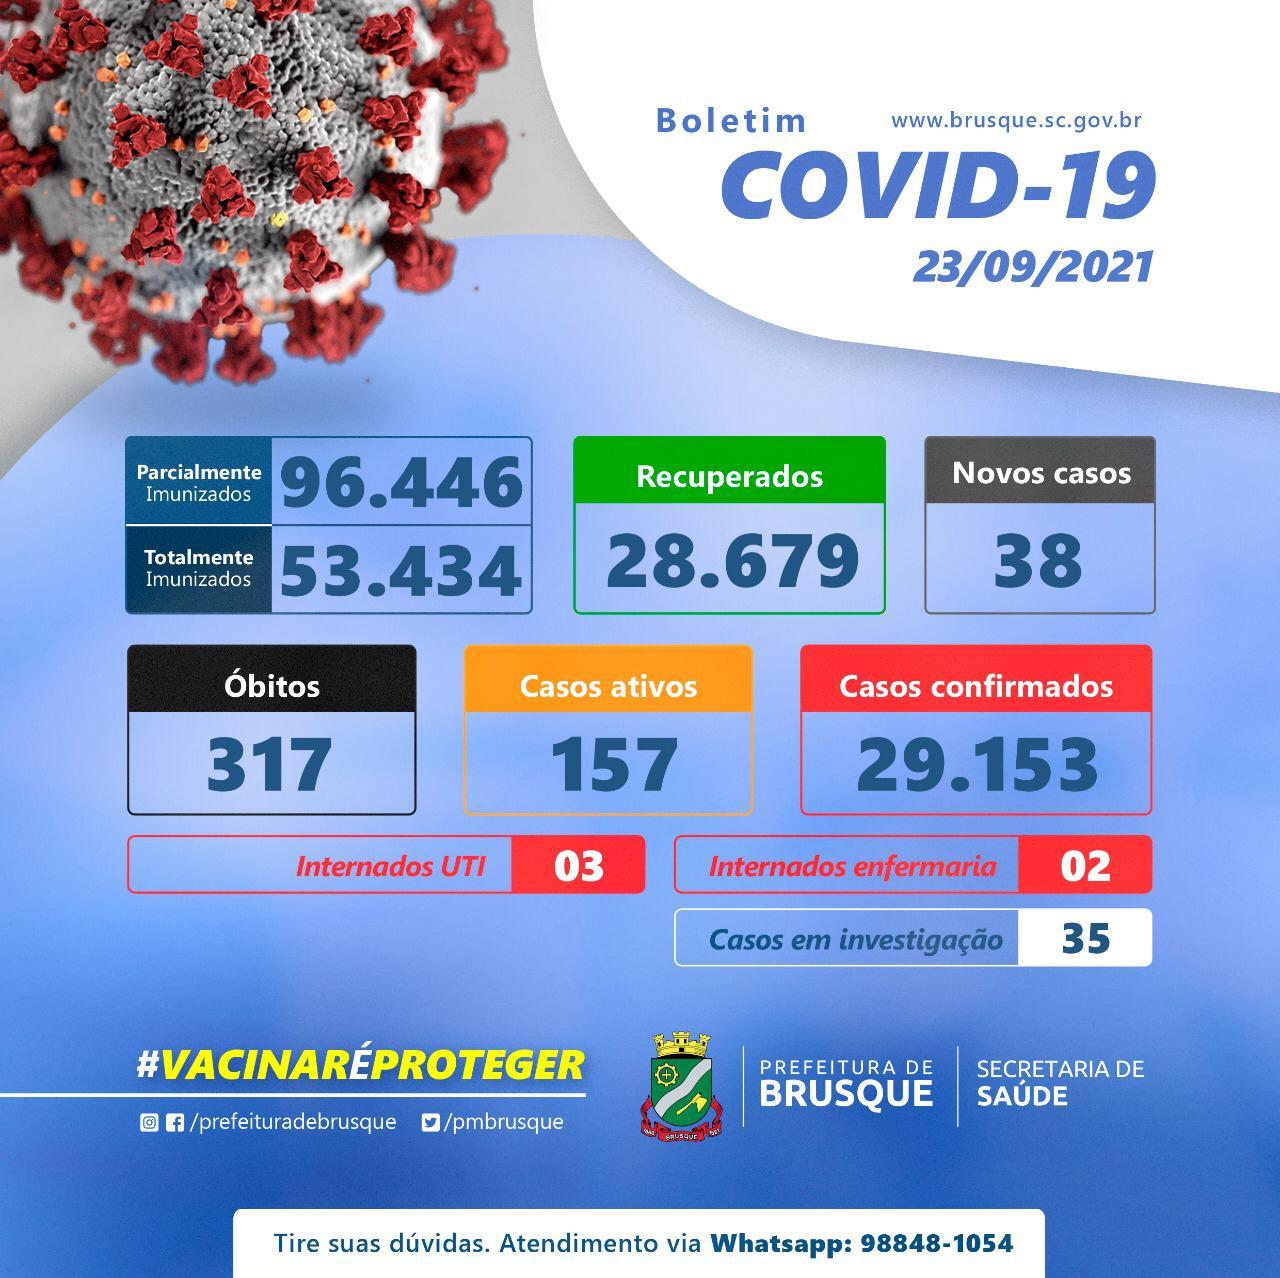 Covid-19: Confira o boletim epidemiológico desta quinta-feira (23)